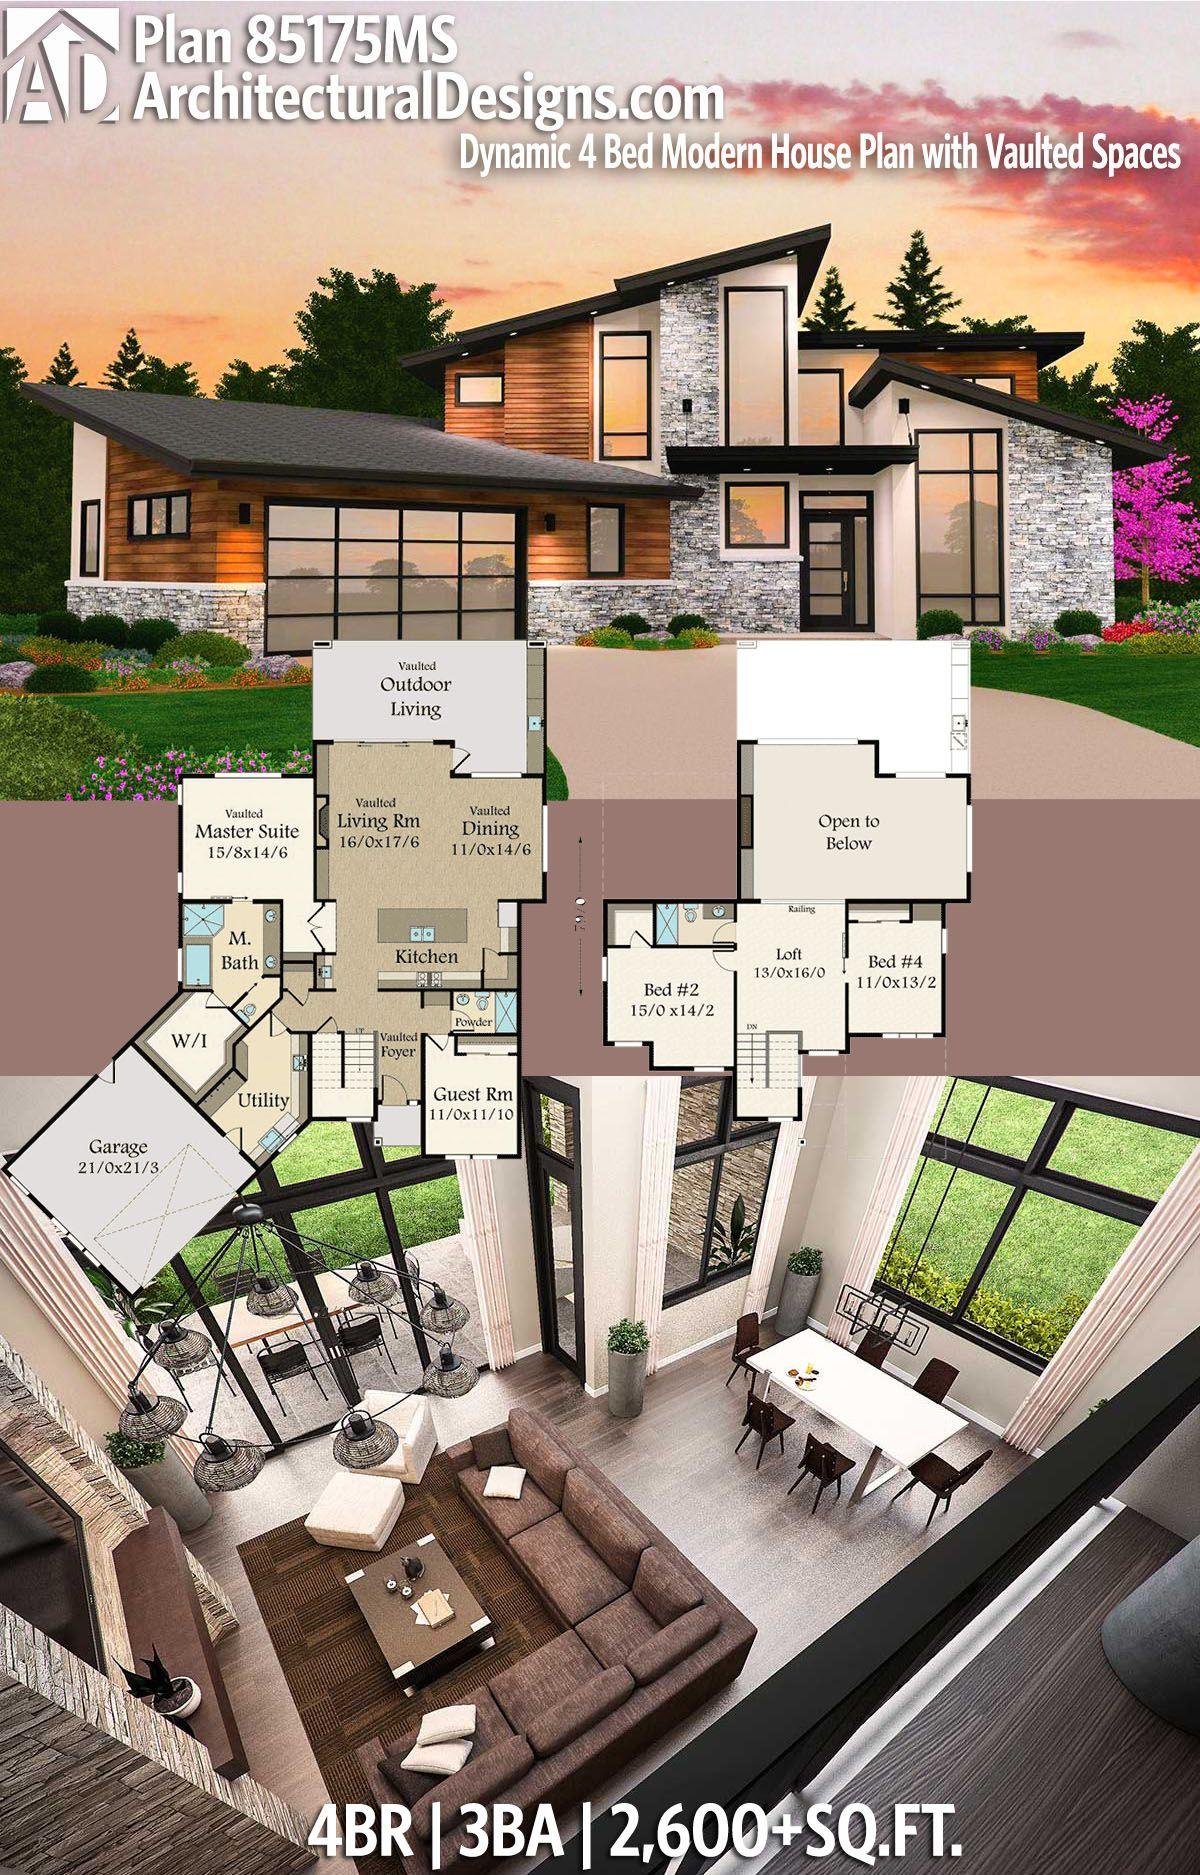 Plan 85175MS Dynamic 4 Bed Modern House